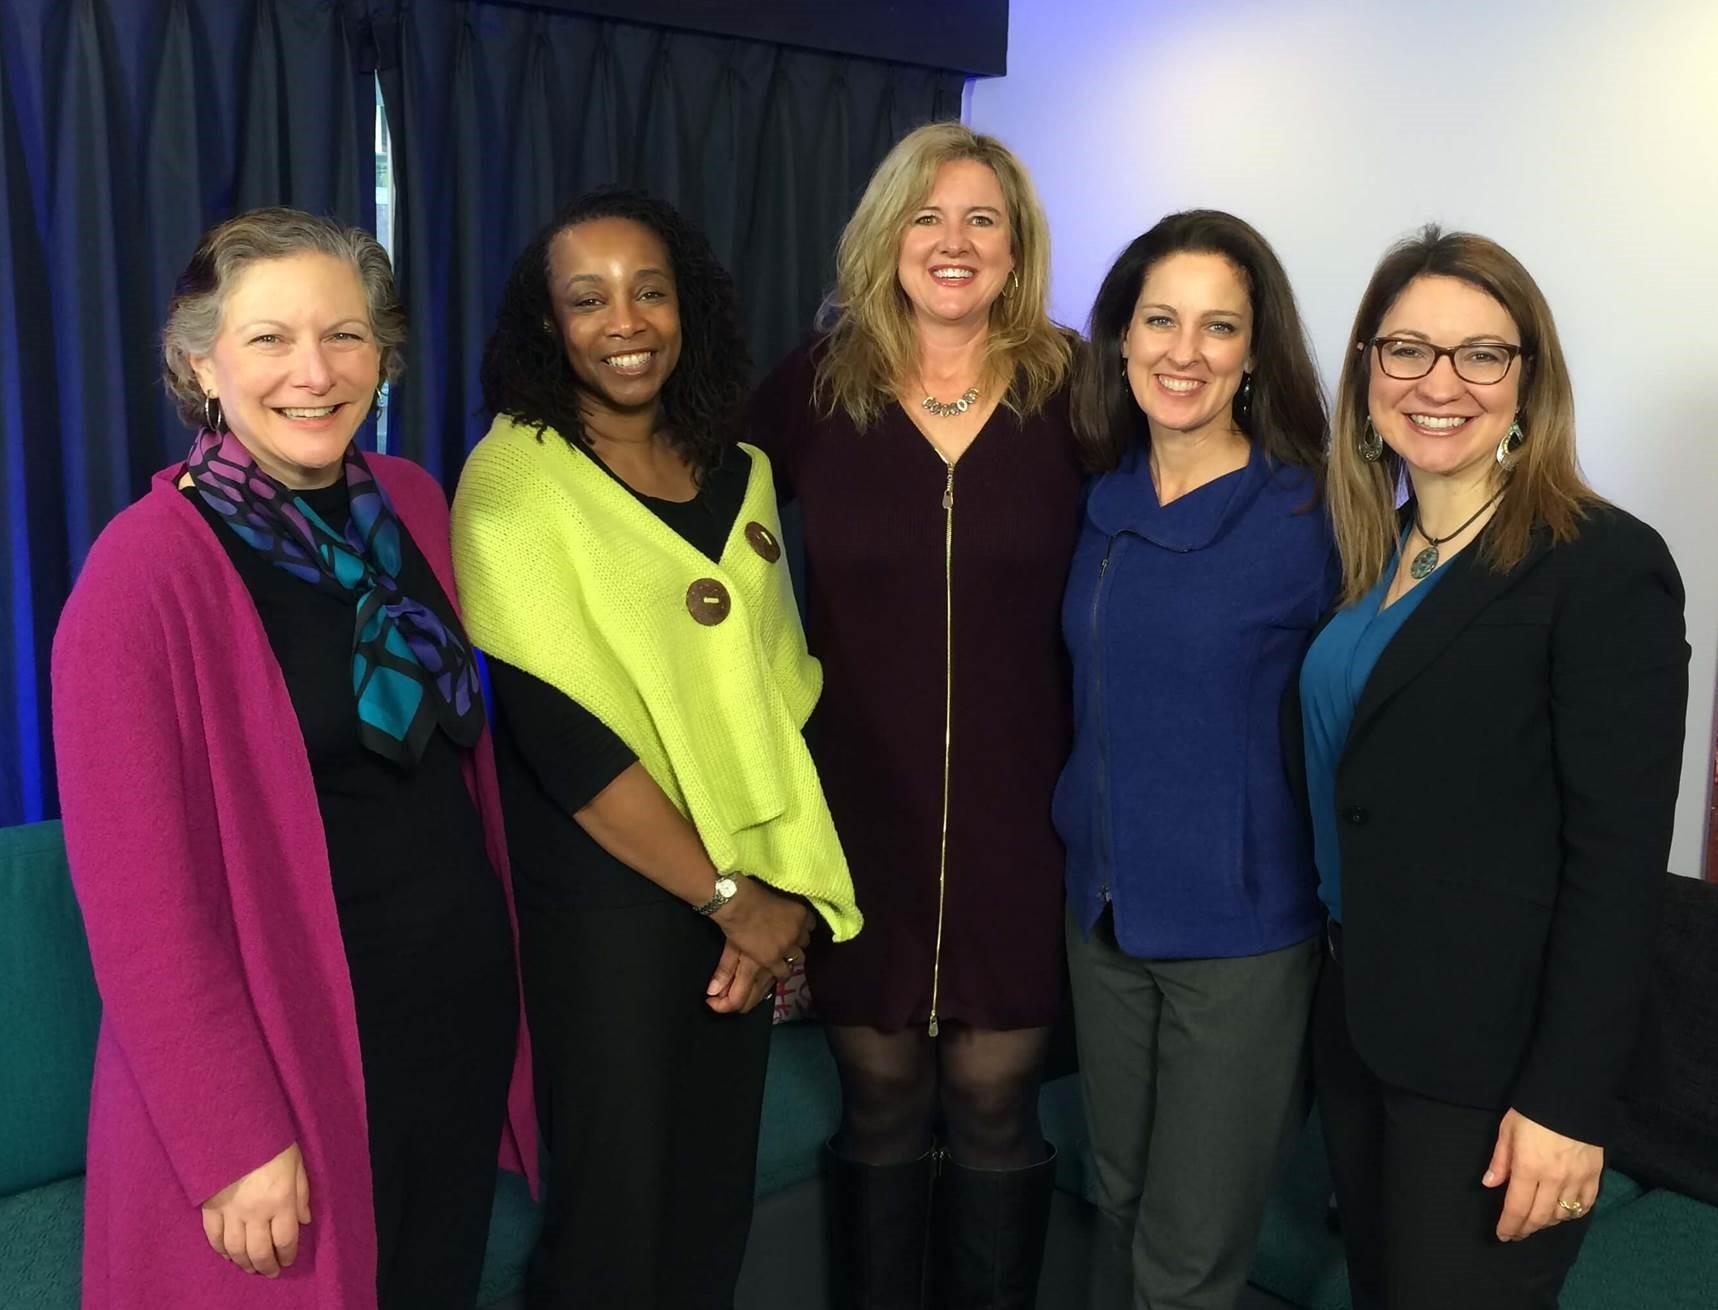 The CEB Women's Bible Editors